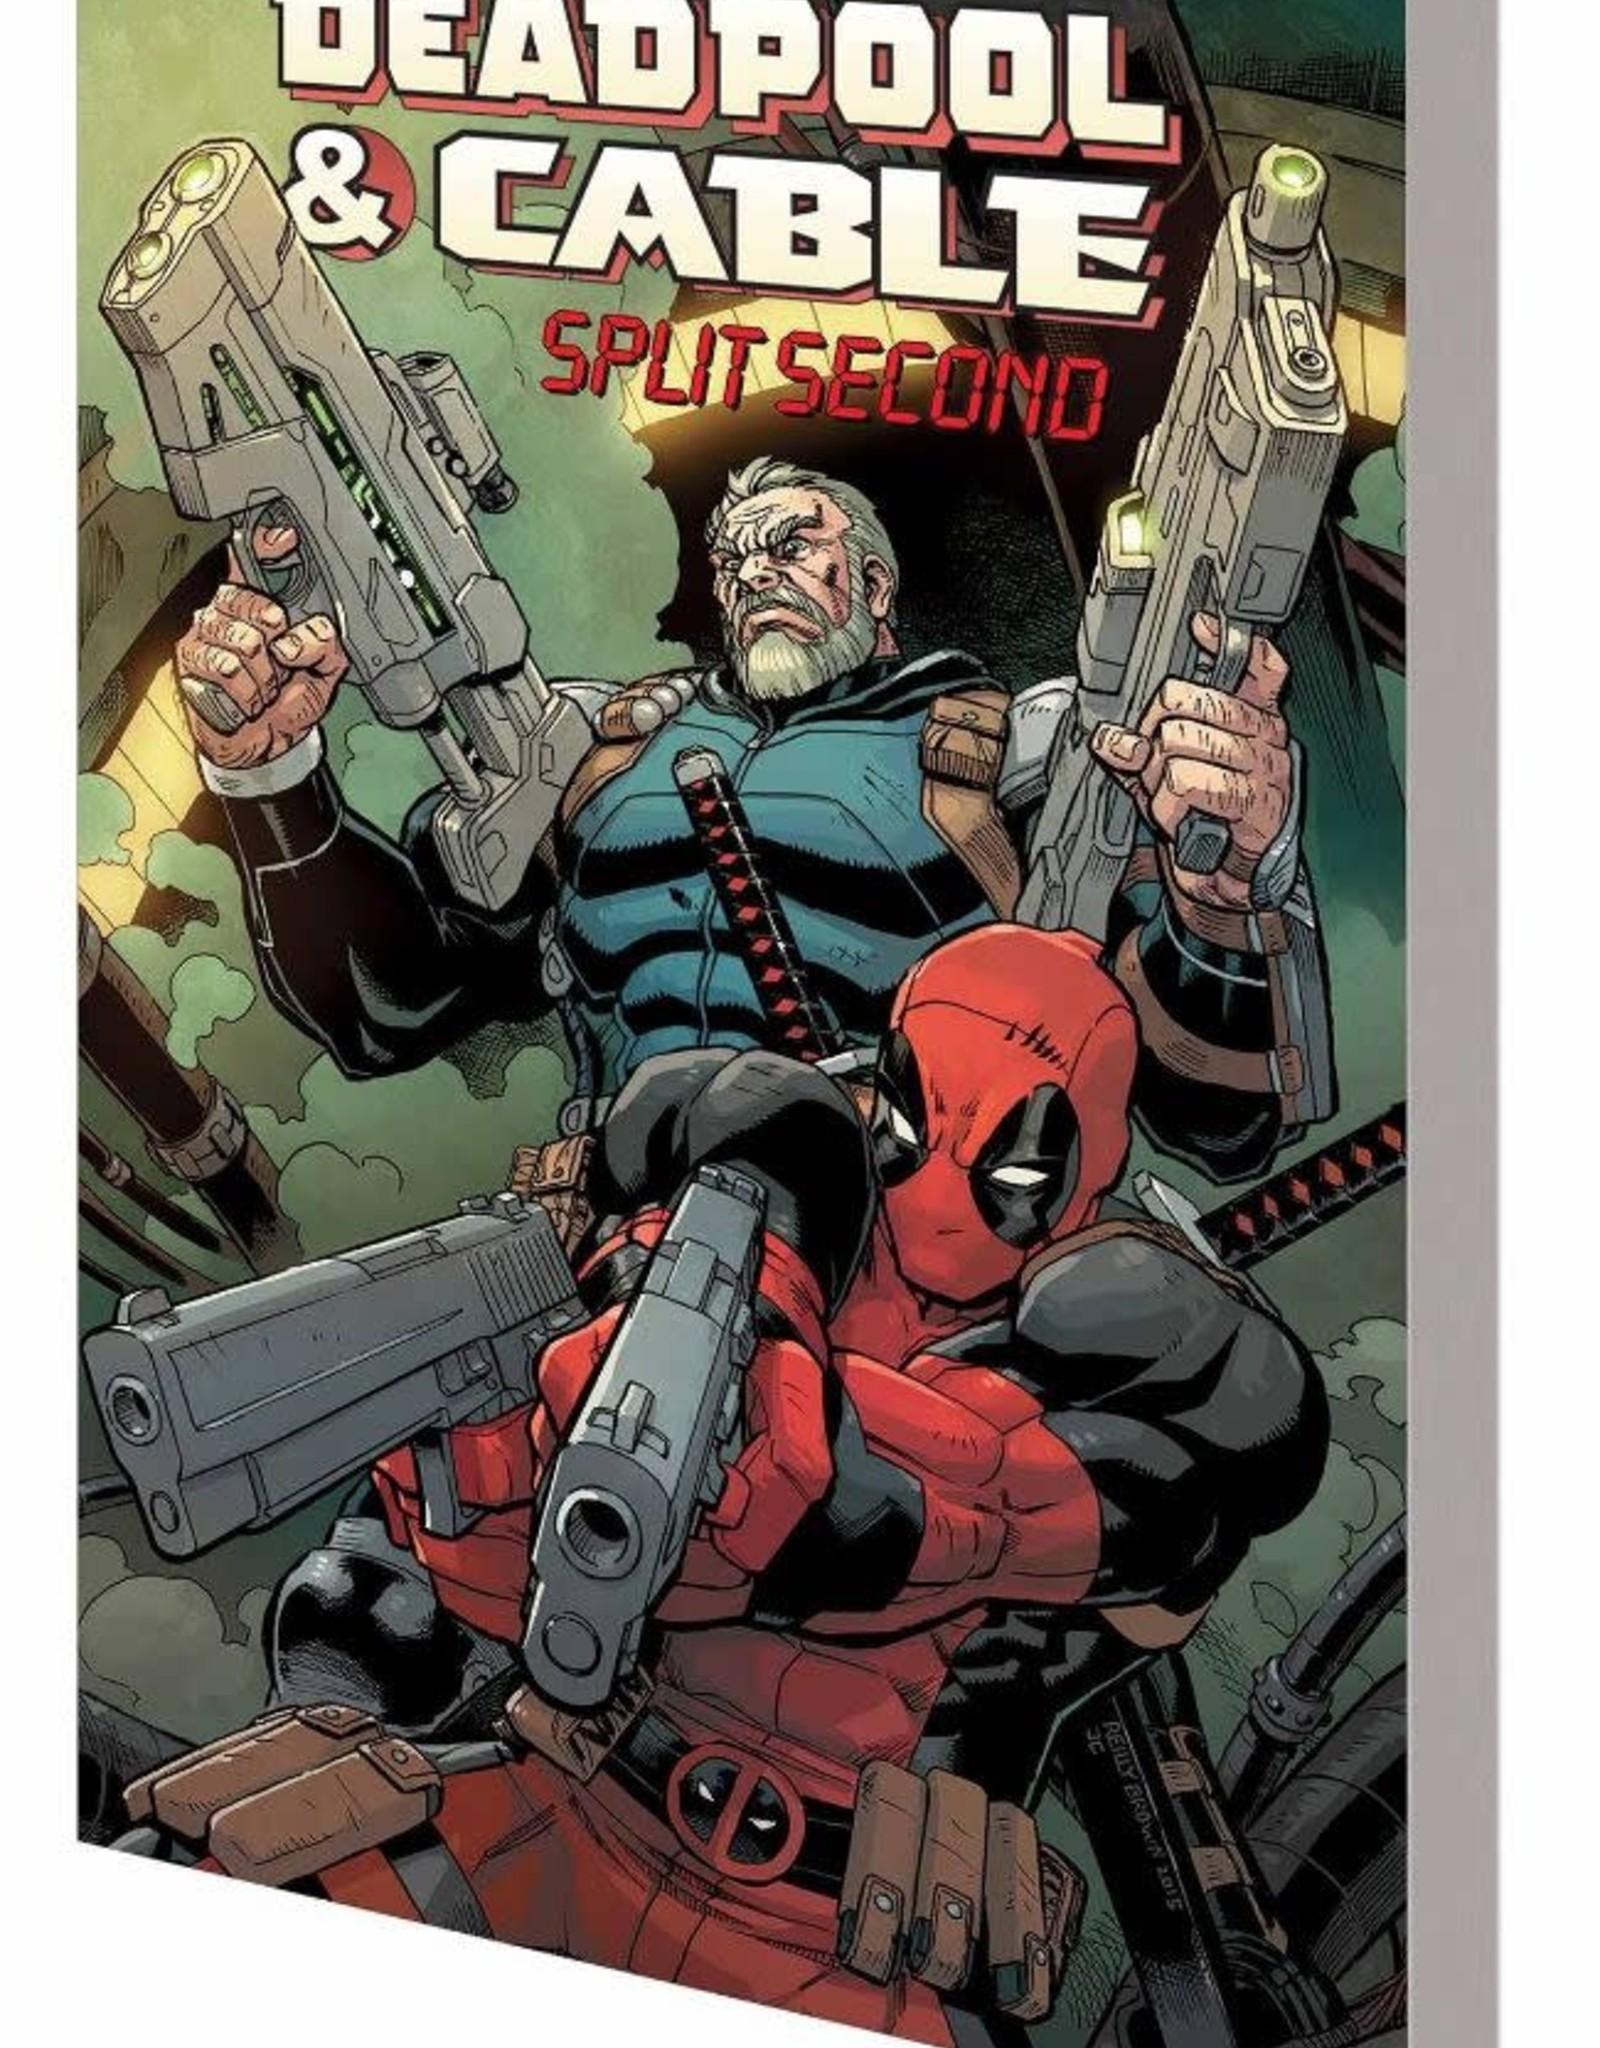 Marvel Comics Deadpool & Cable Split Second